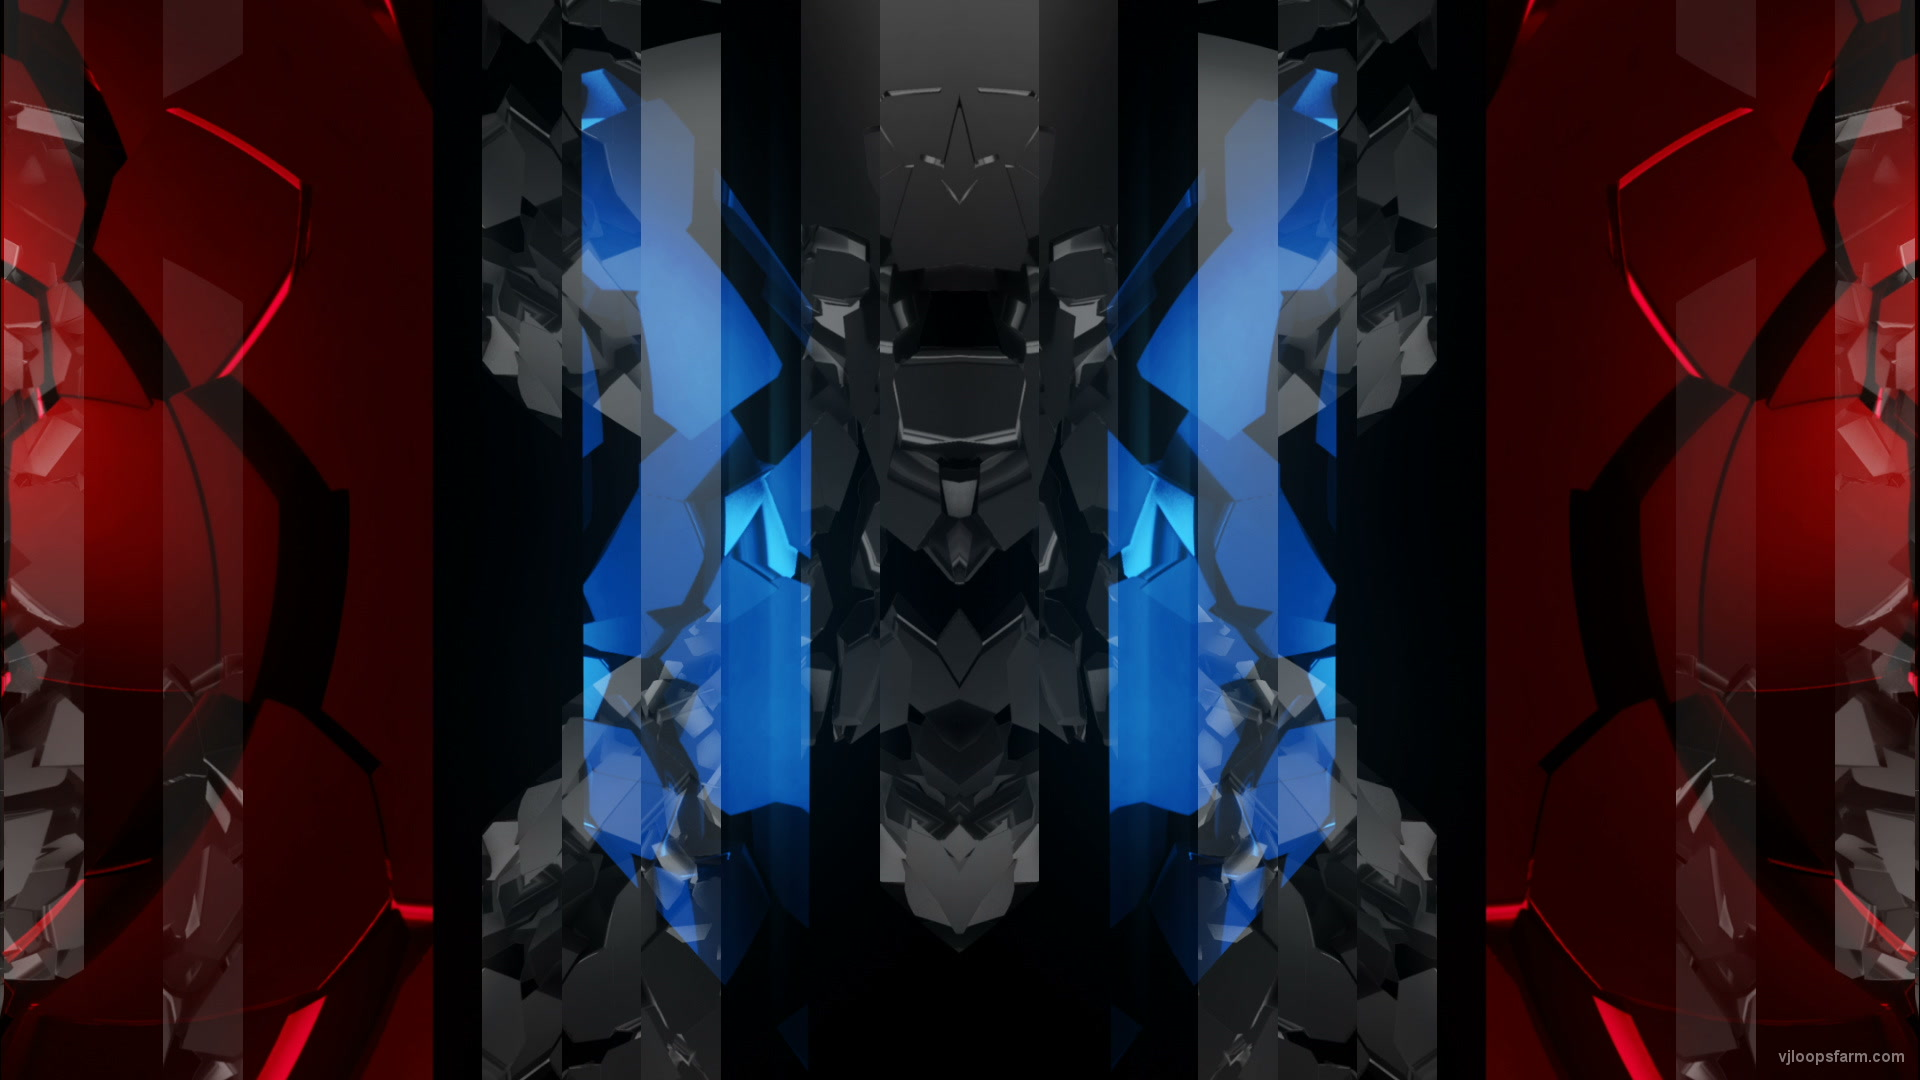 vj video background Red-Blue-Sword-Line-Elements-Exclusive-Video-Art-VJ-Loop_003